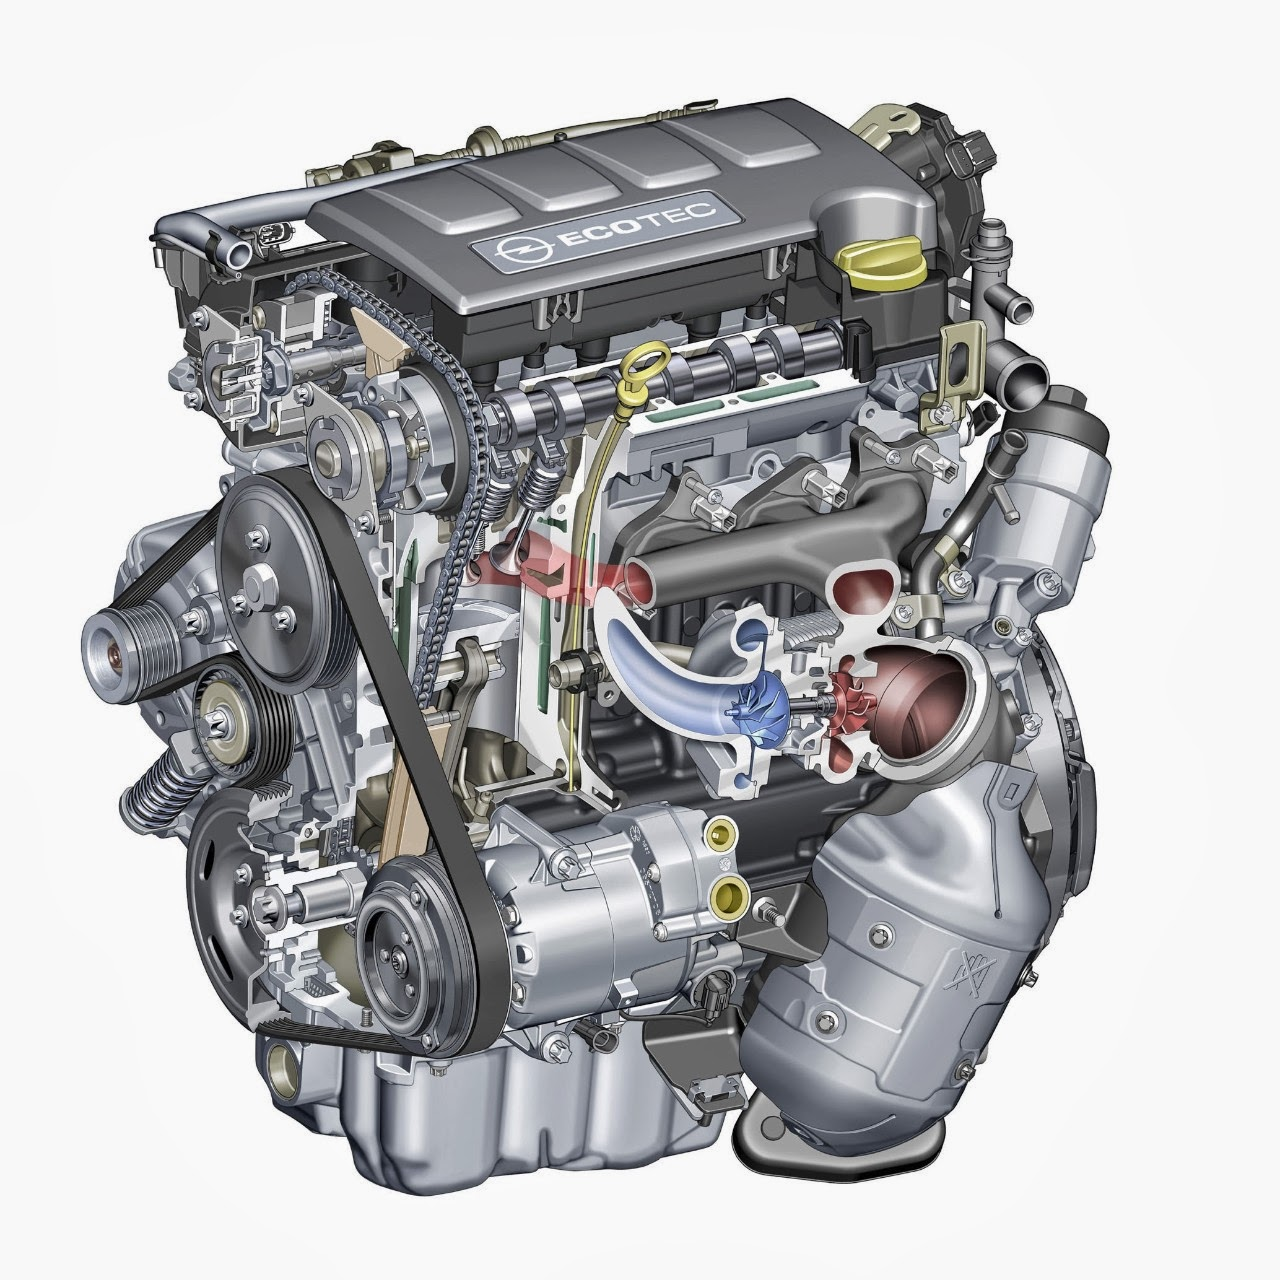 3 7 liter engine thermostat location